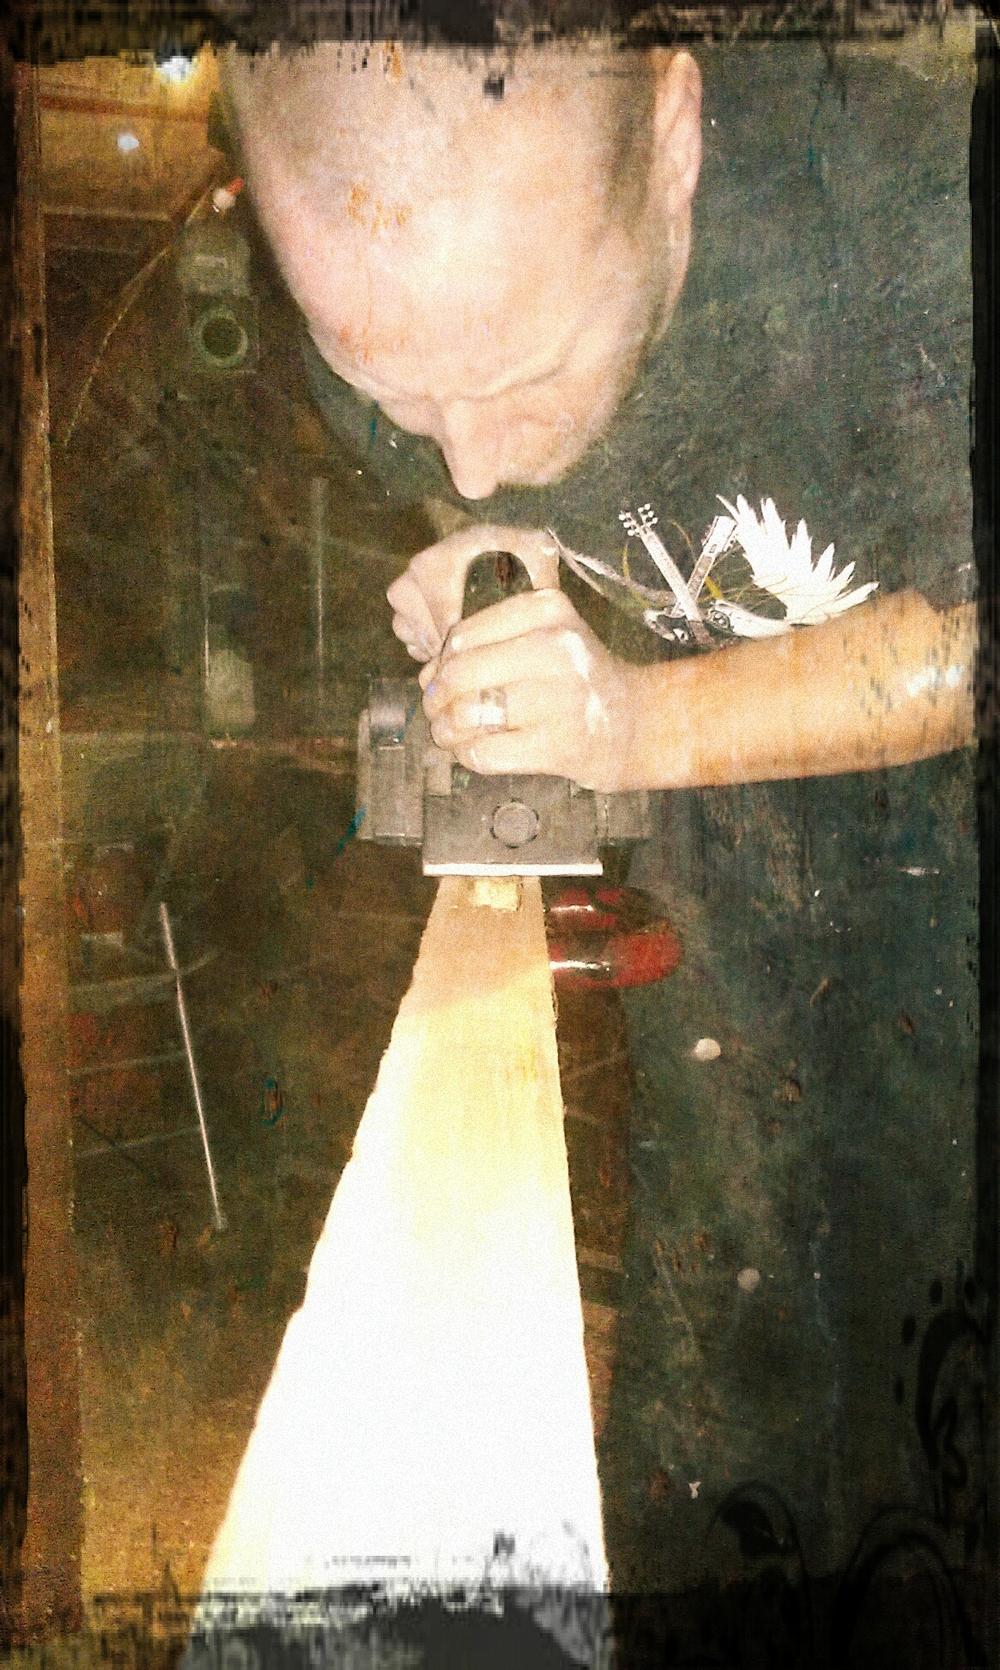 IMAG0587_Harry_Metal_Trashy2.jpg